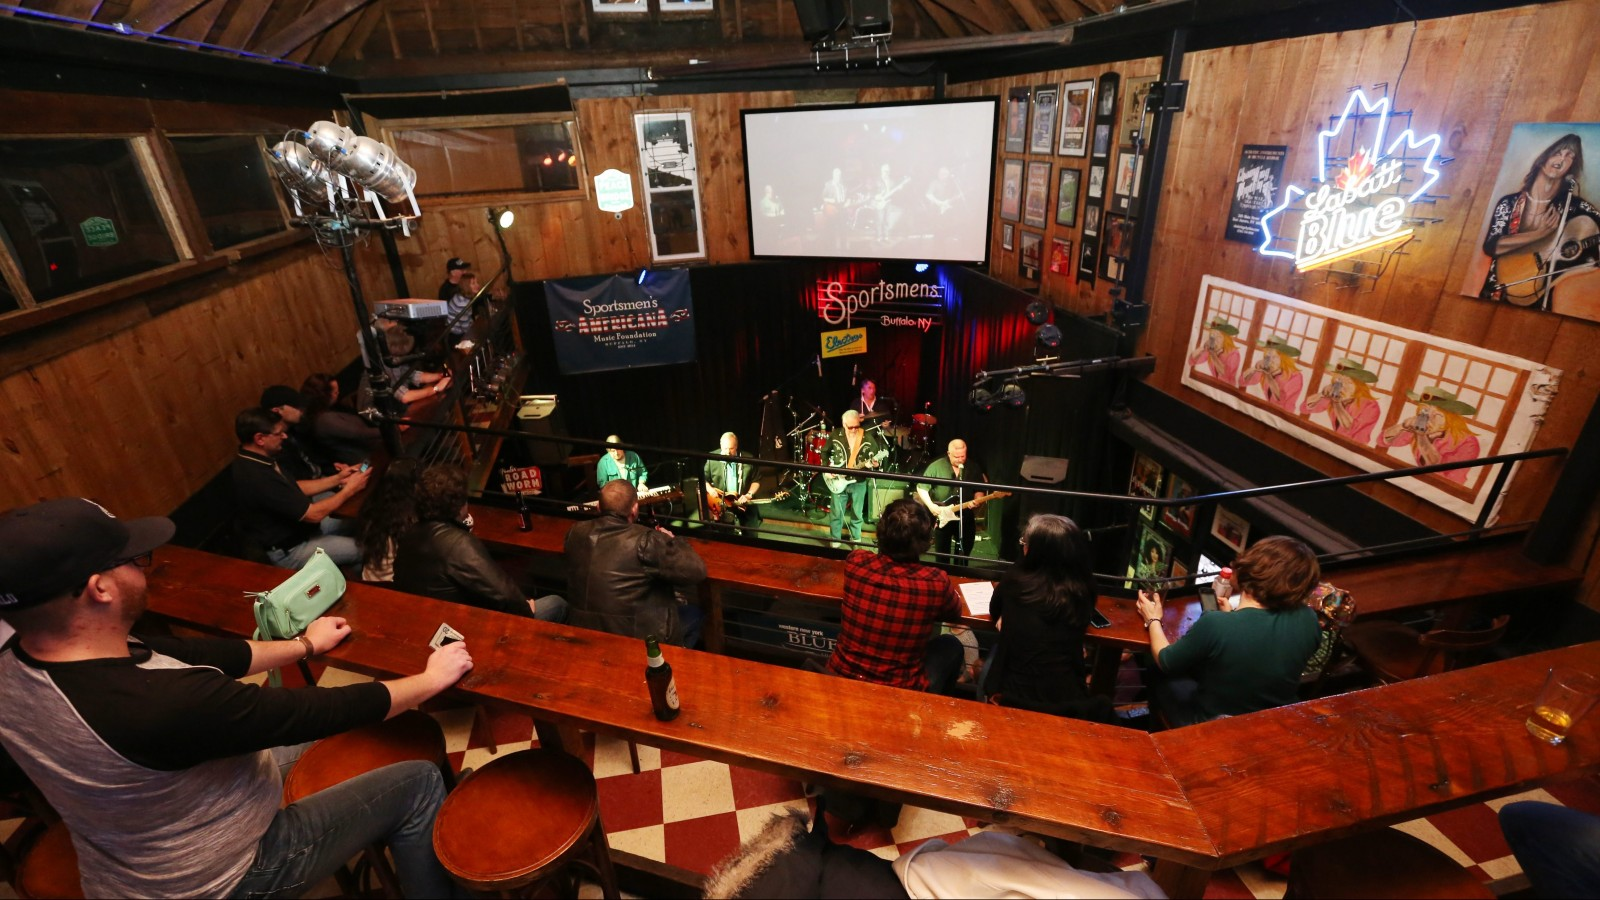 Buffalo Blues band, The Electras, brought out a good crowd to the Sportsmen's Tavern, Thursday, March 12, 2015. (Sharon Cantillon/Buffalo News)